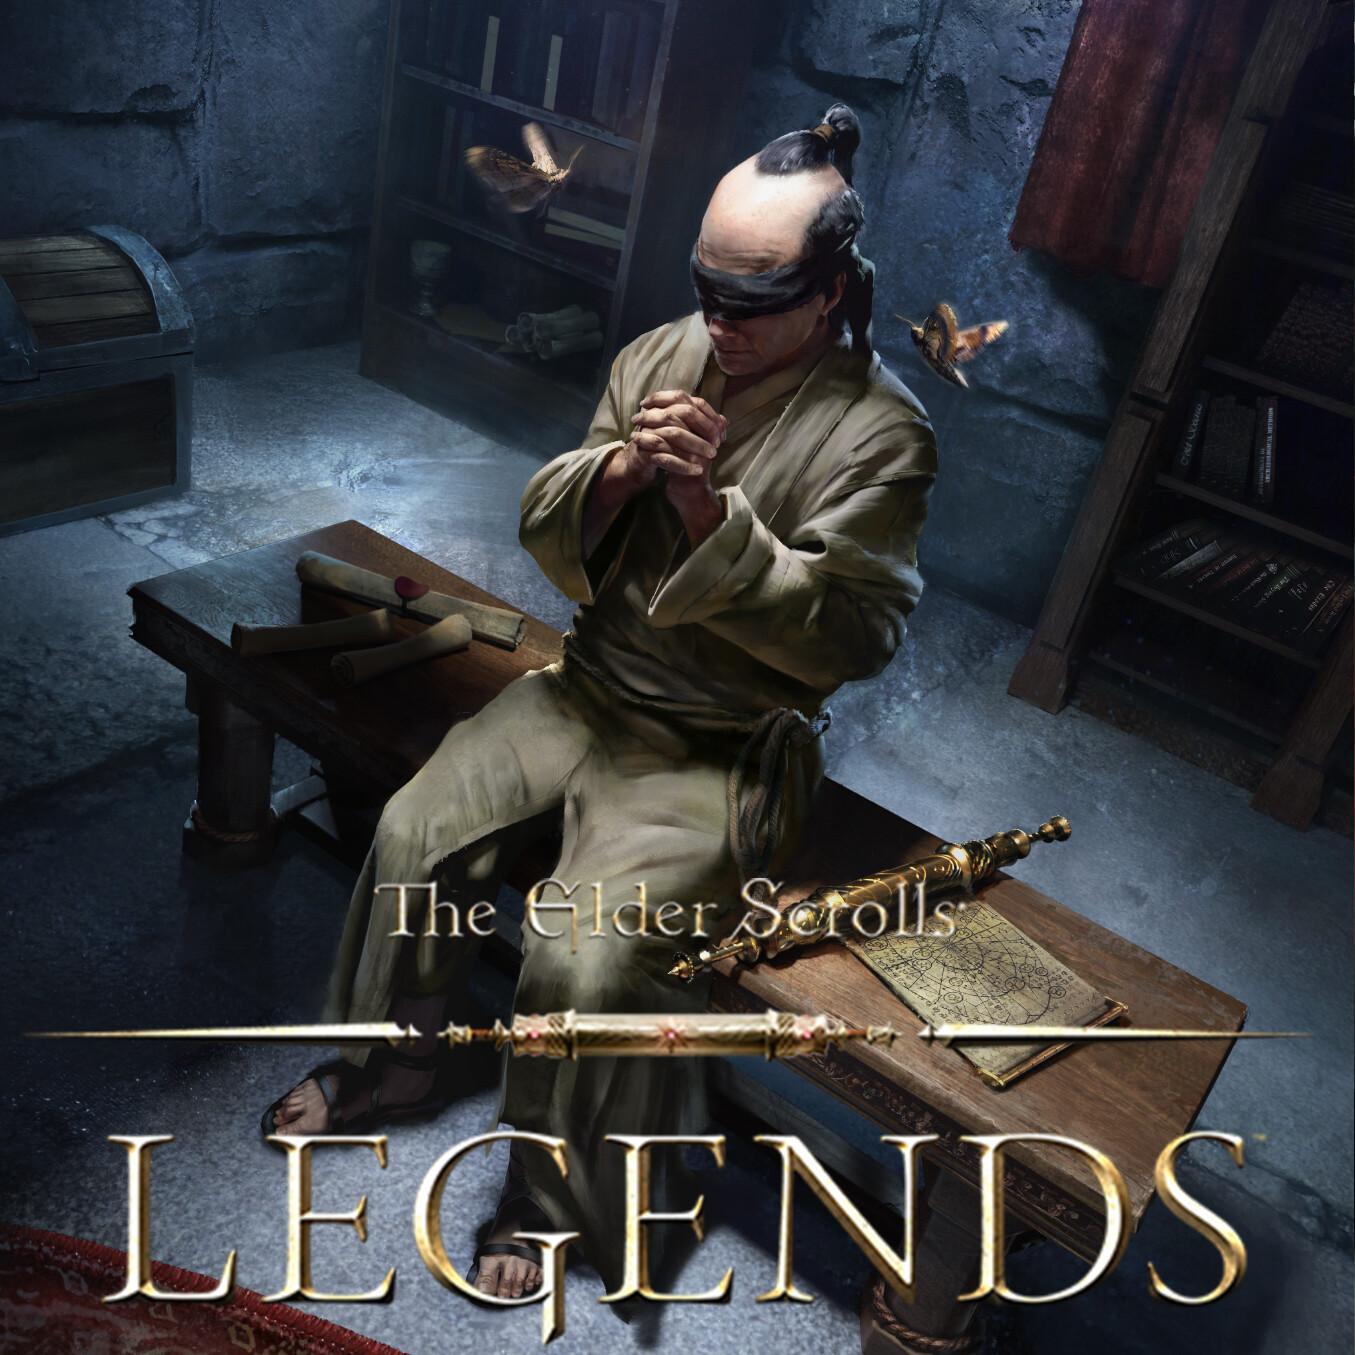 Blind Moth Priest - The Elder Scrolls: Legends